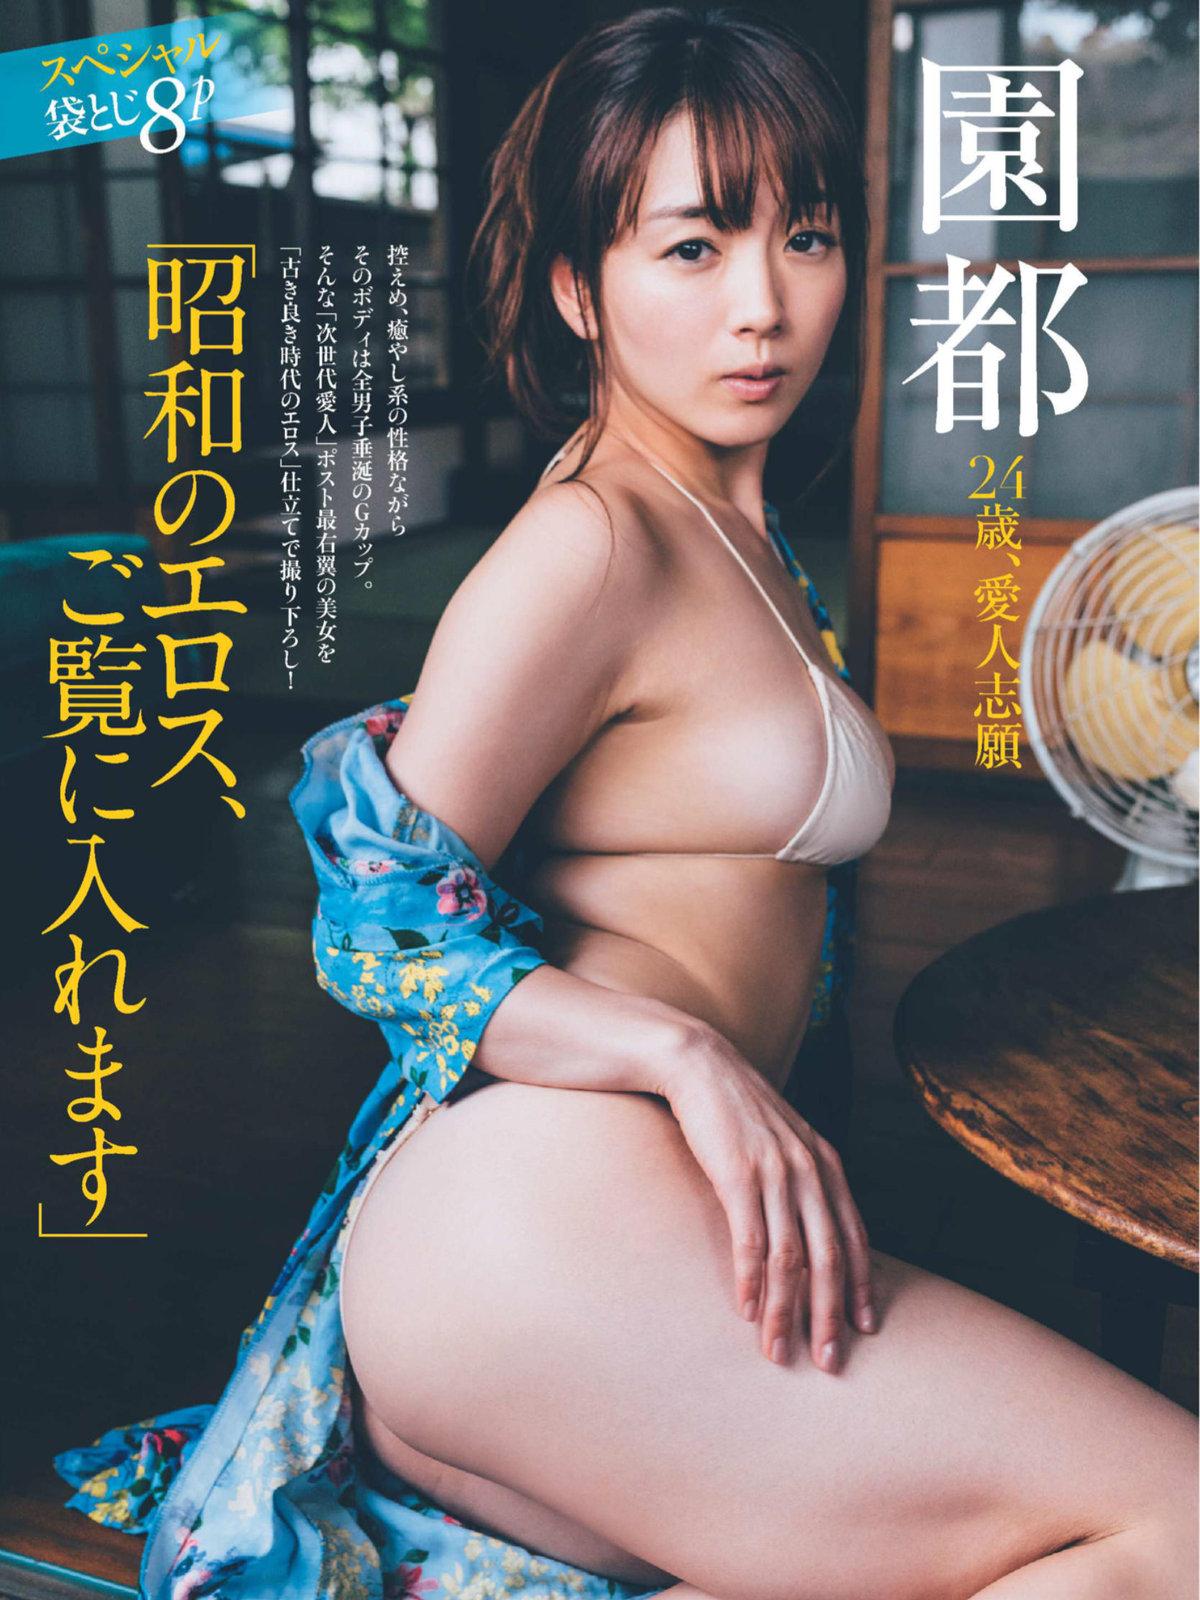 Miyako Sono 園都, FRIDAY 2017.08.04 (フライデー 2017年08月04日号)